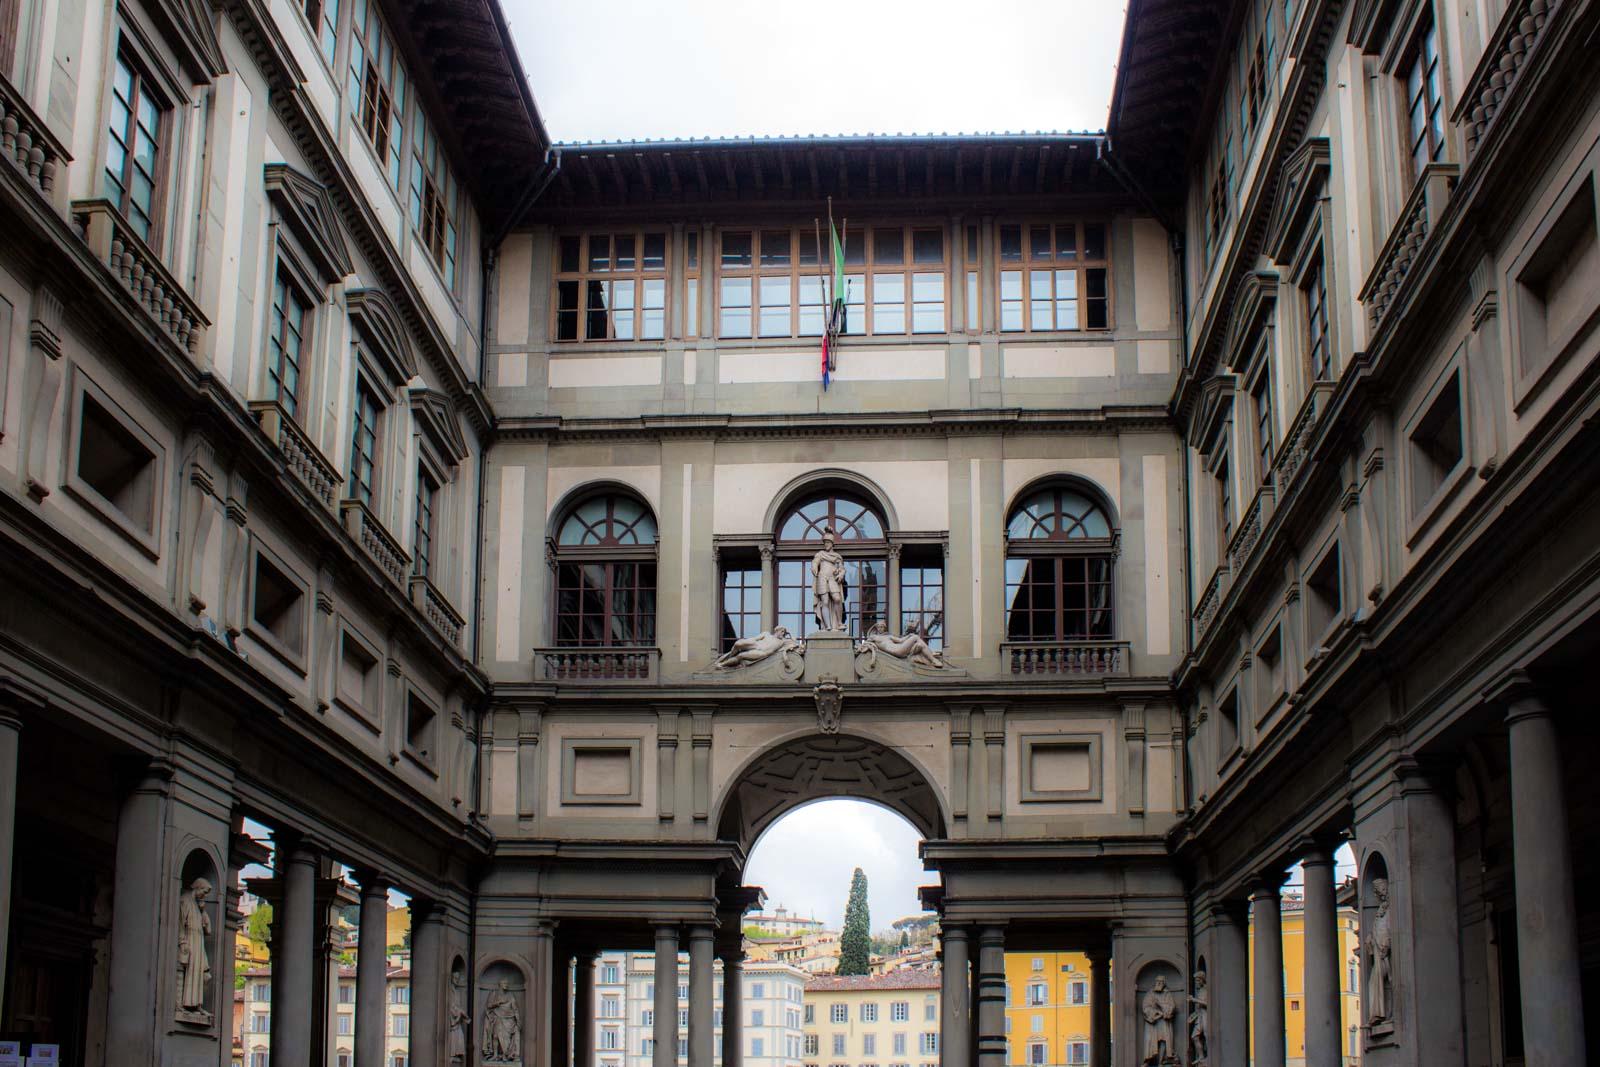 Uffizi Venus de' Medici